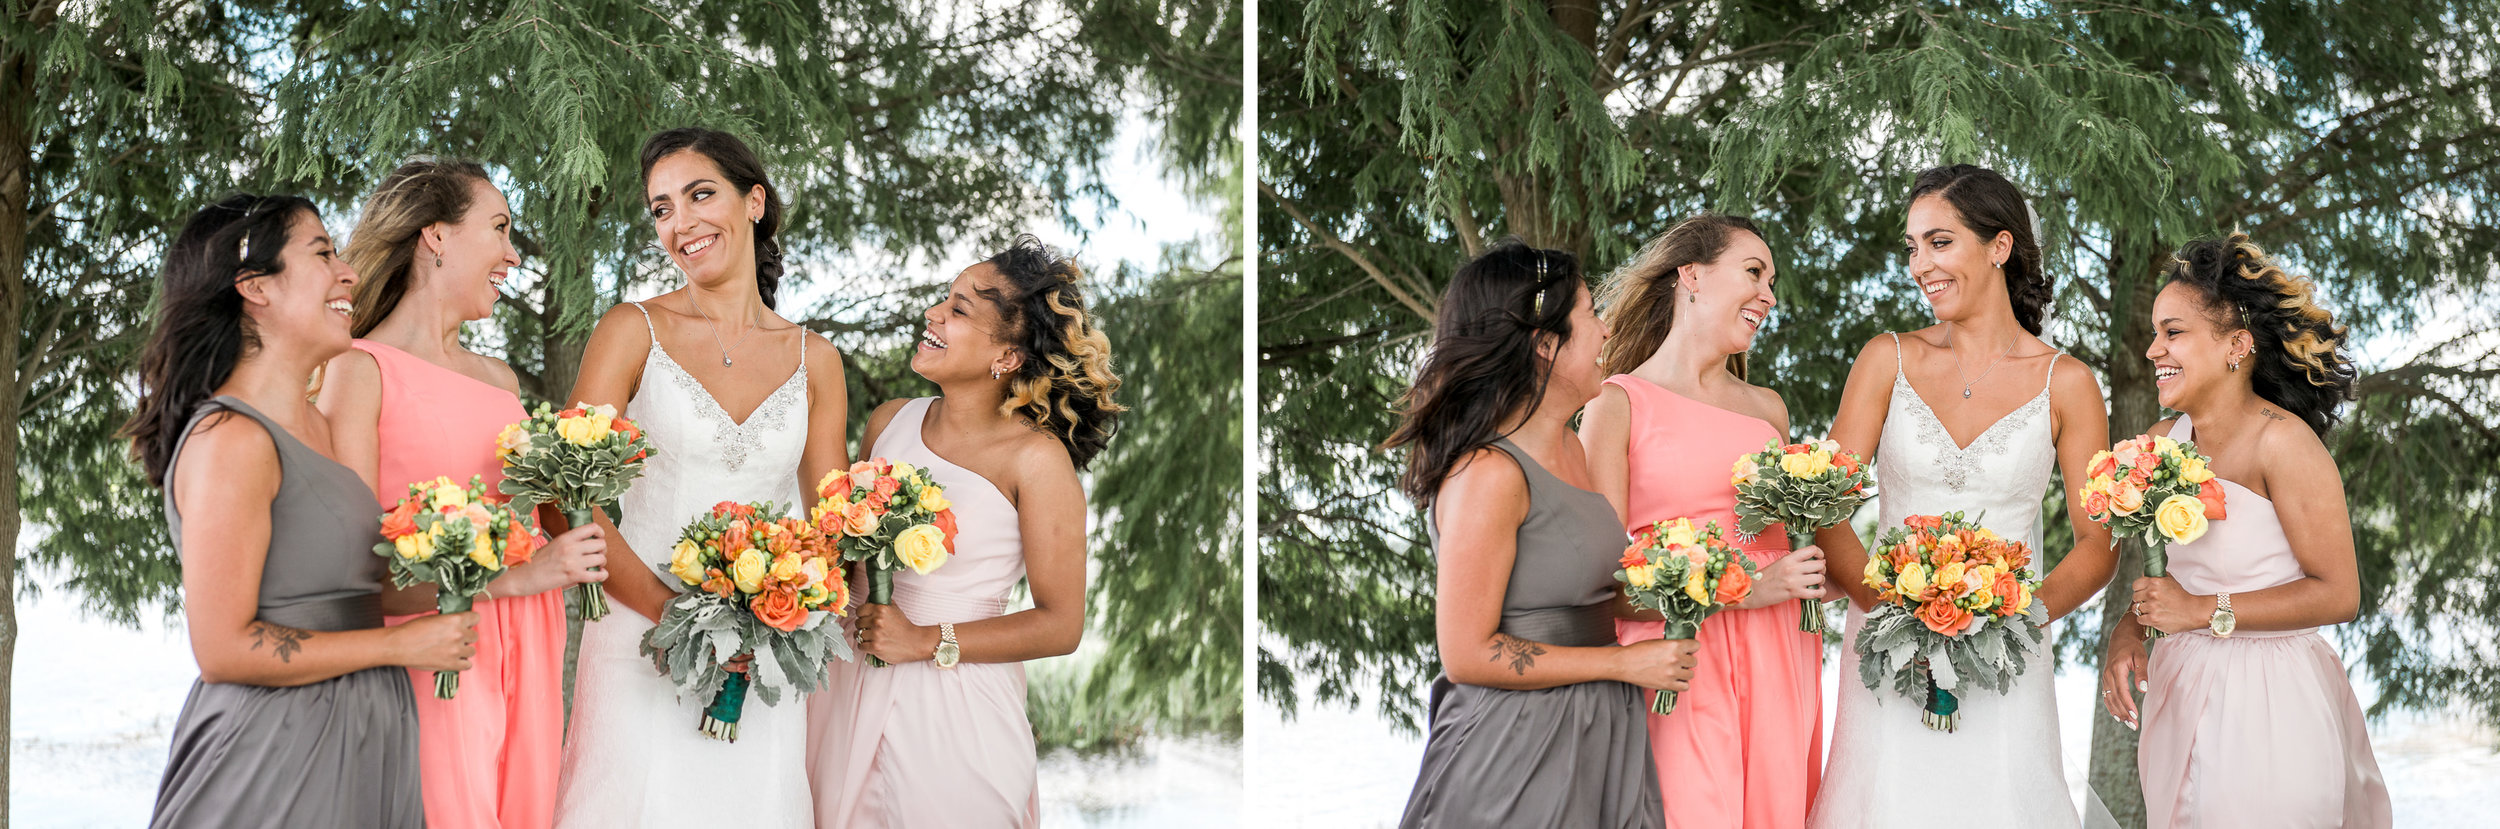 KateTaramykinStudios-Kissimmee-Wedding-Arzola-15.jpg